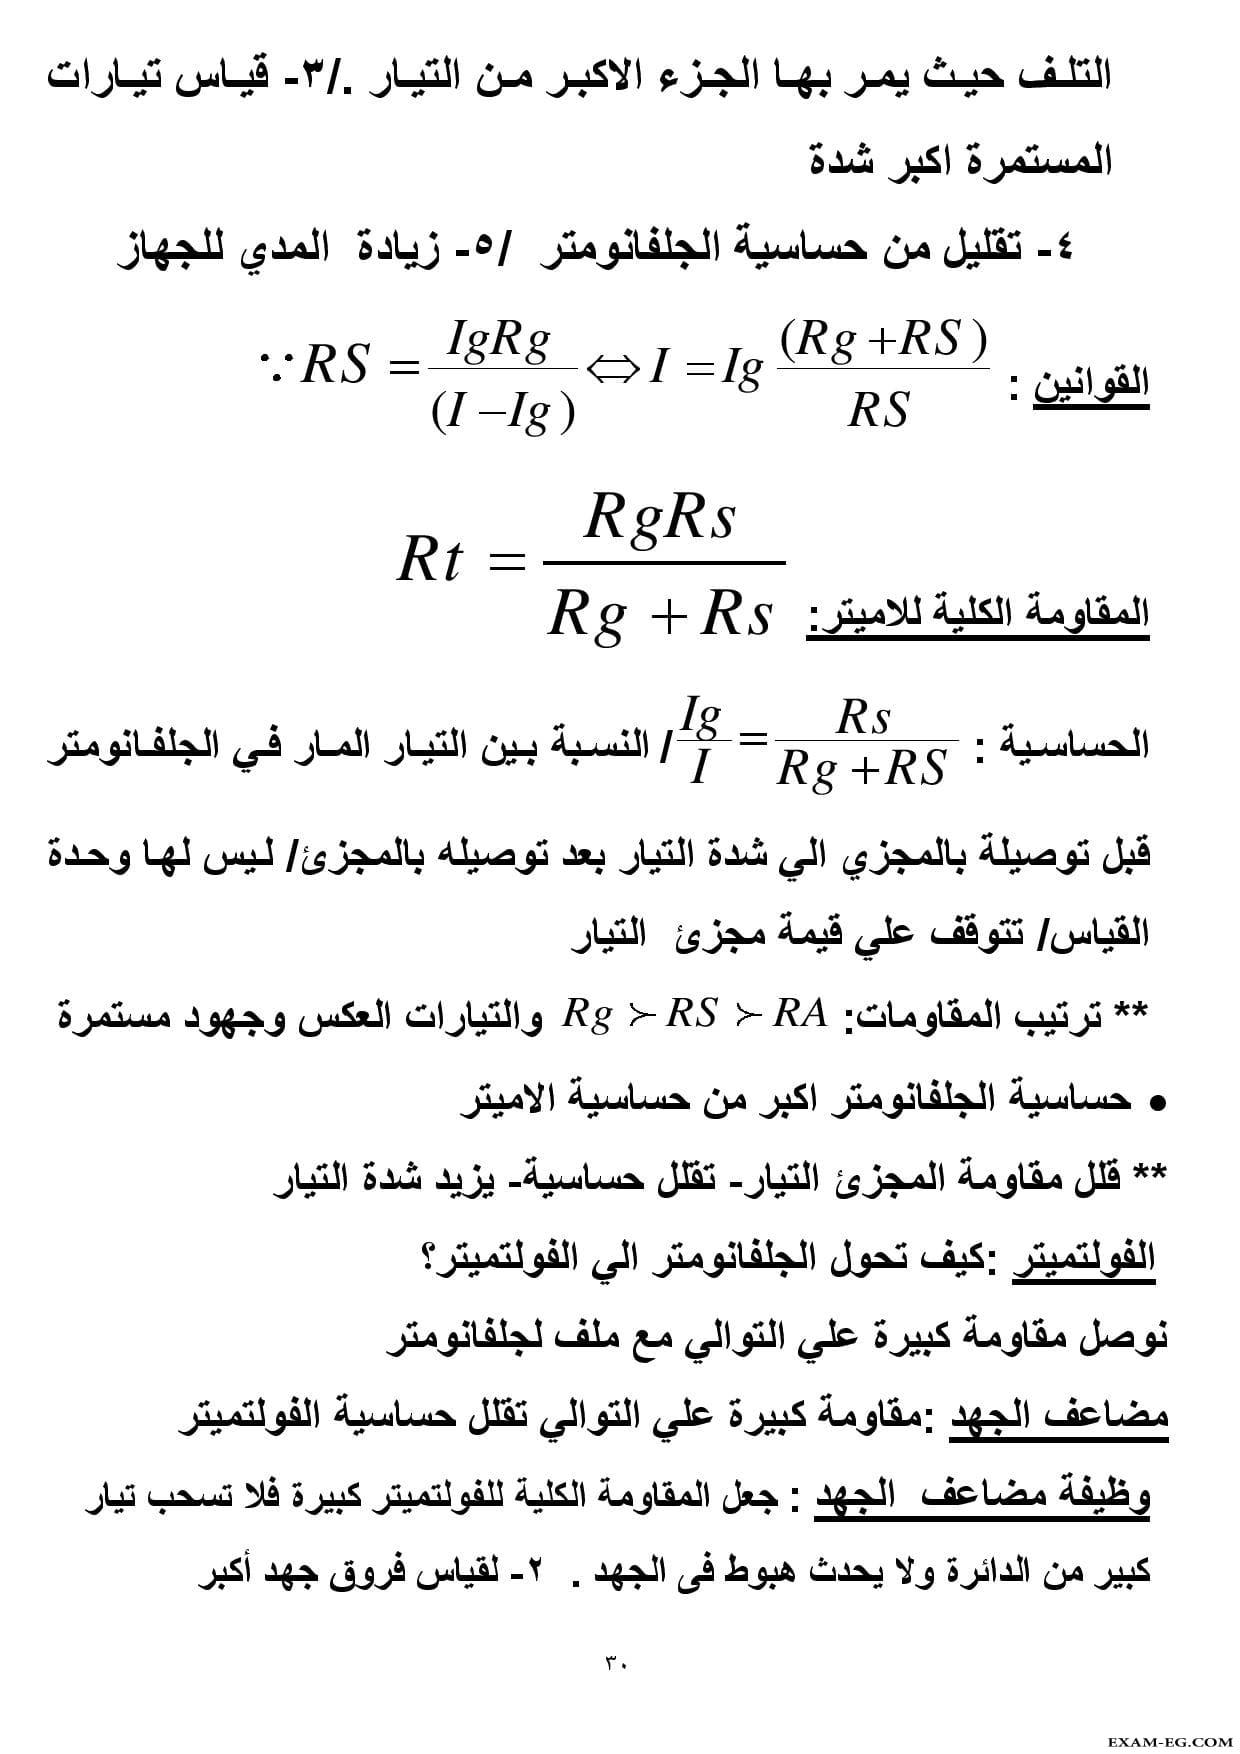 exam-eg.com_151688089843311.jpg